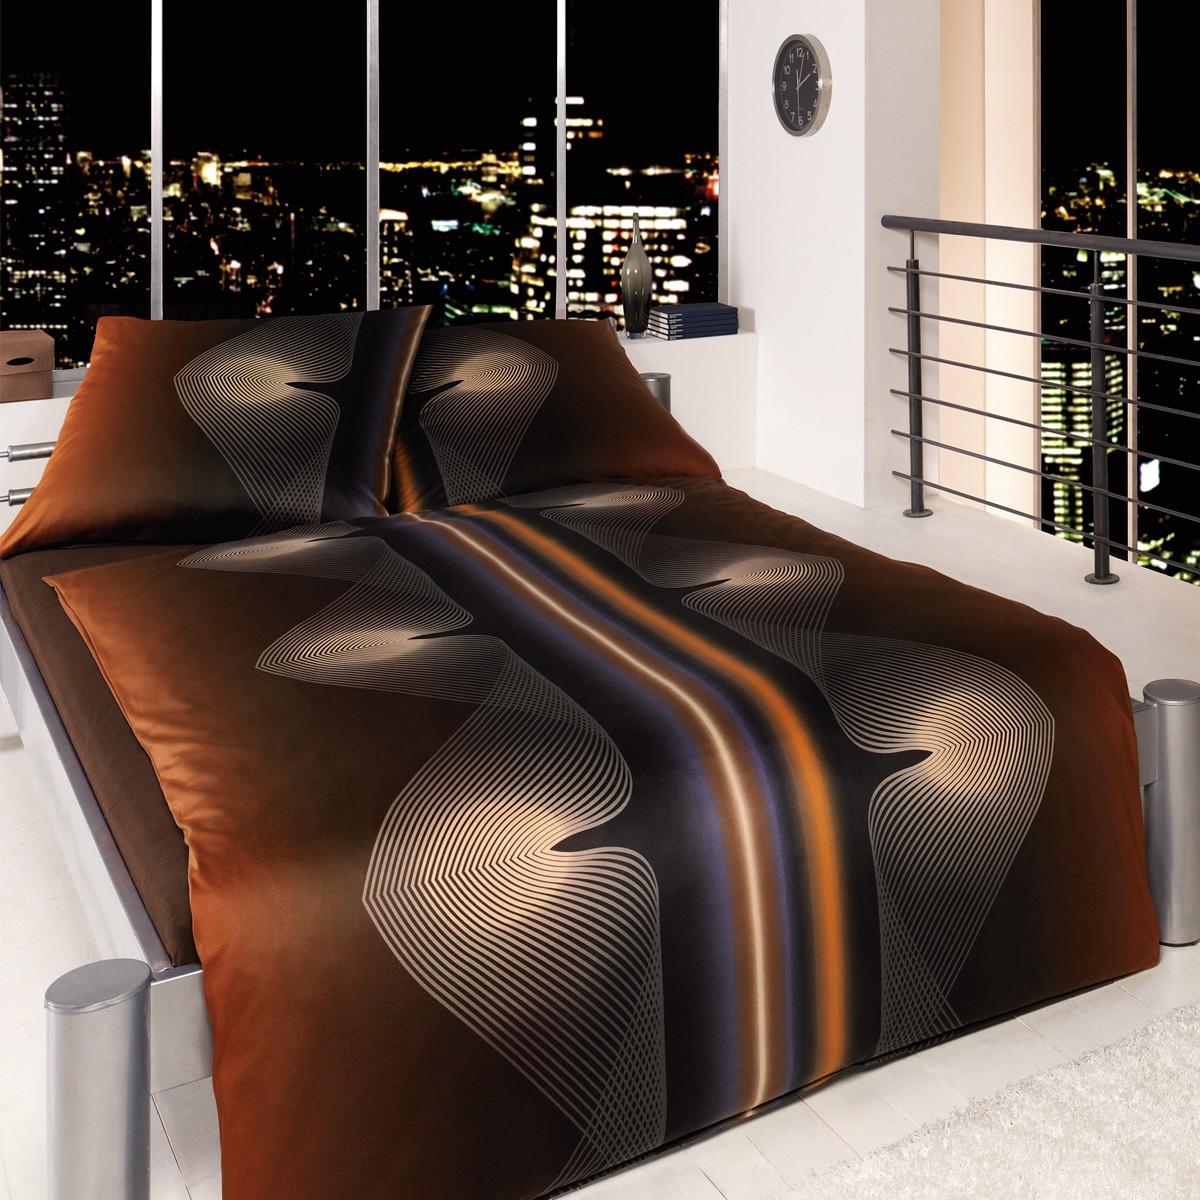 estella mako interlock jersey esteban 6420 960 kupfer 3963. Black Bedroom Furniture Sets. Home Design Ideas